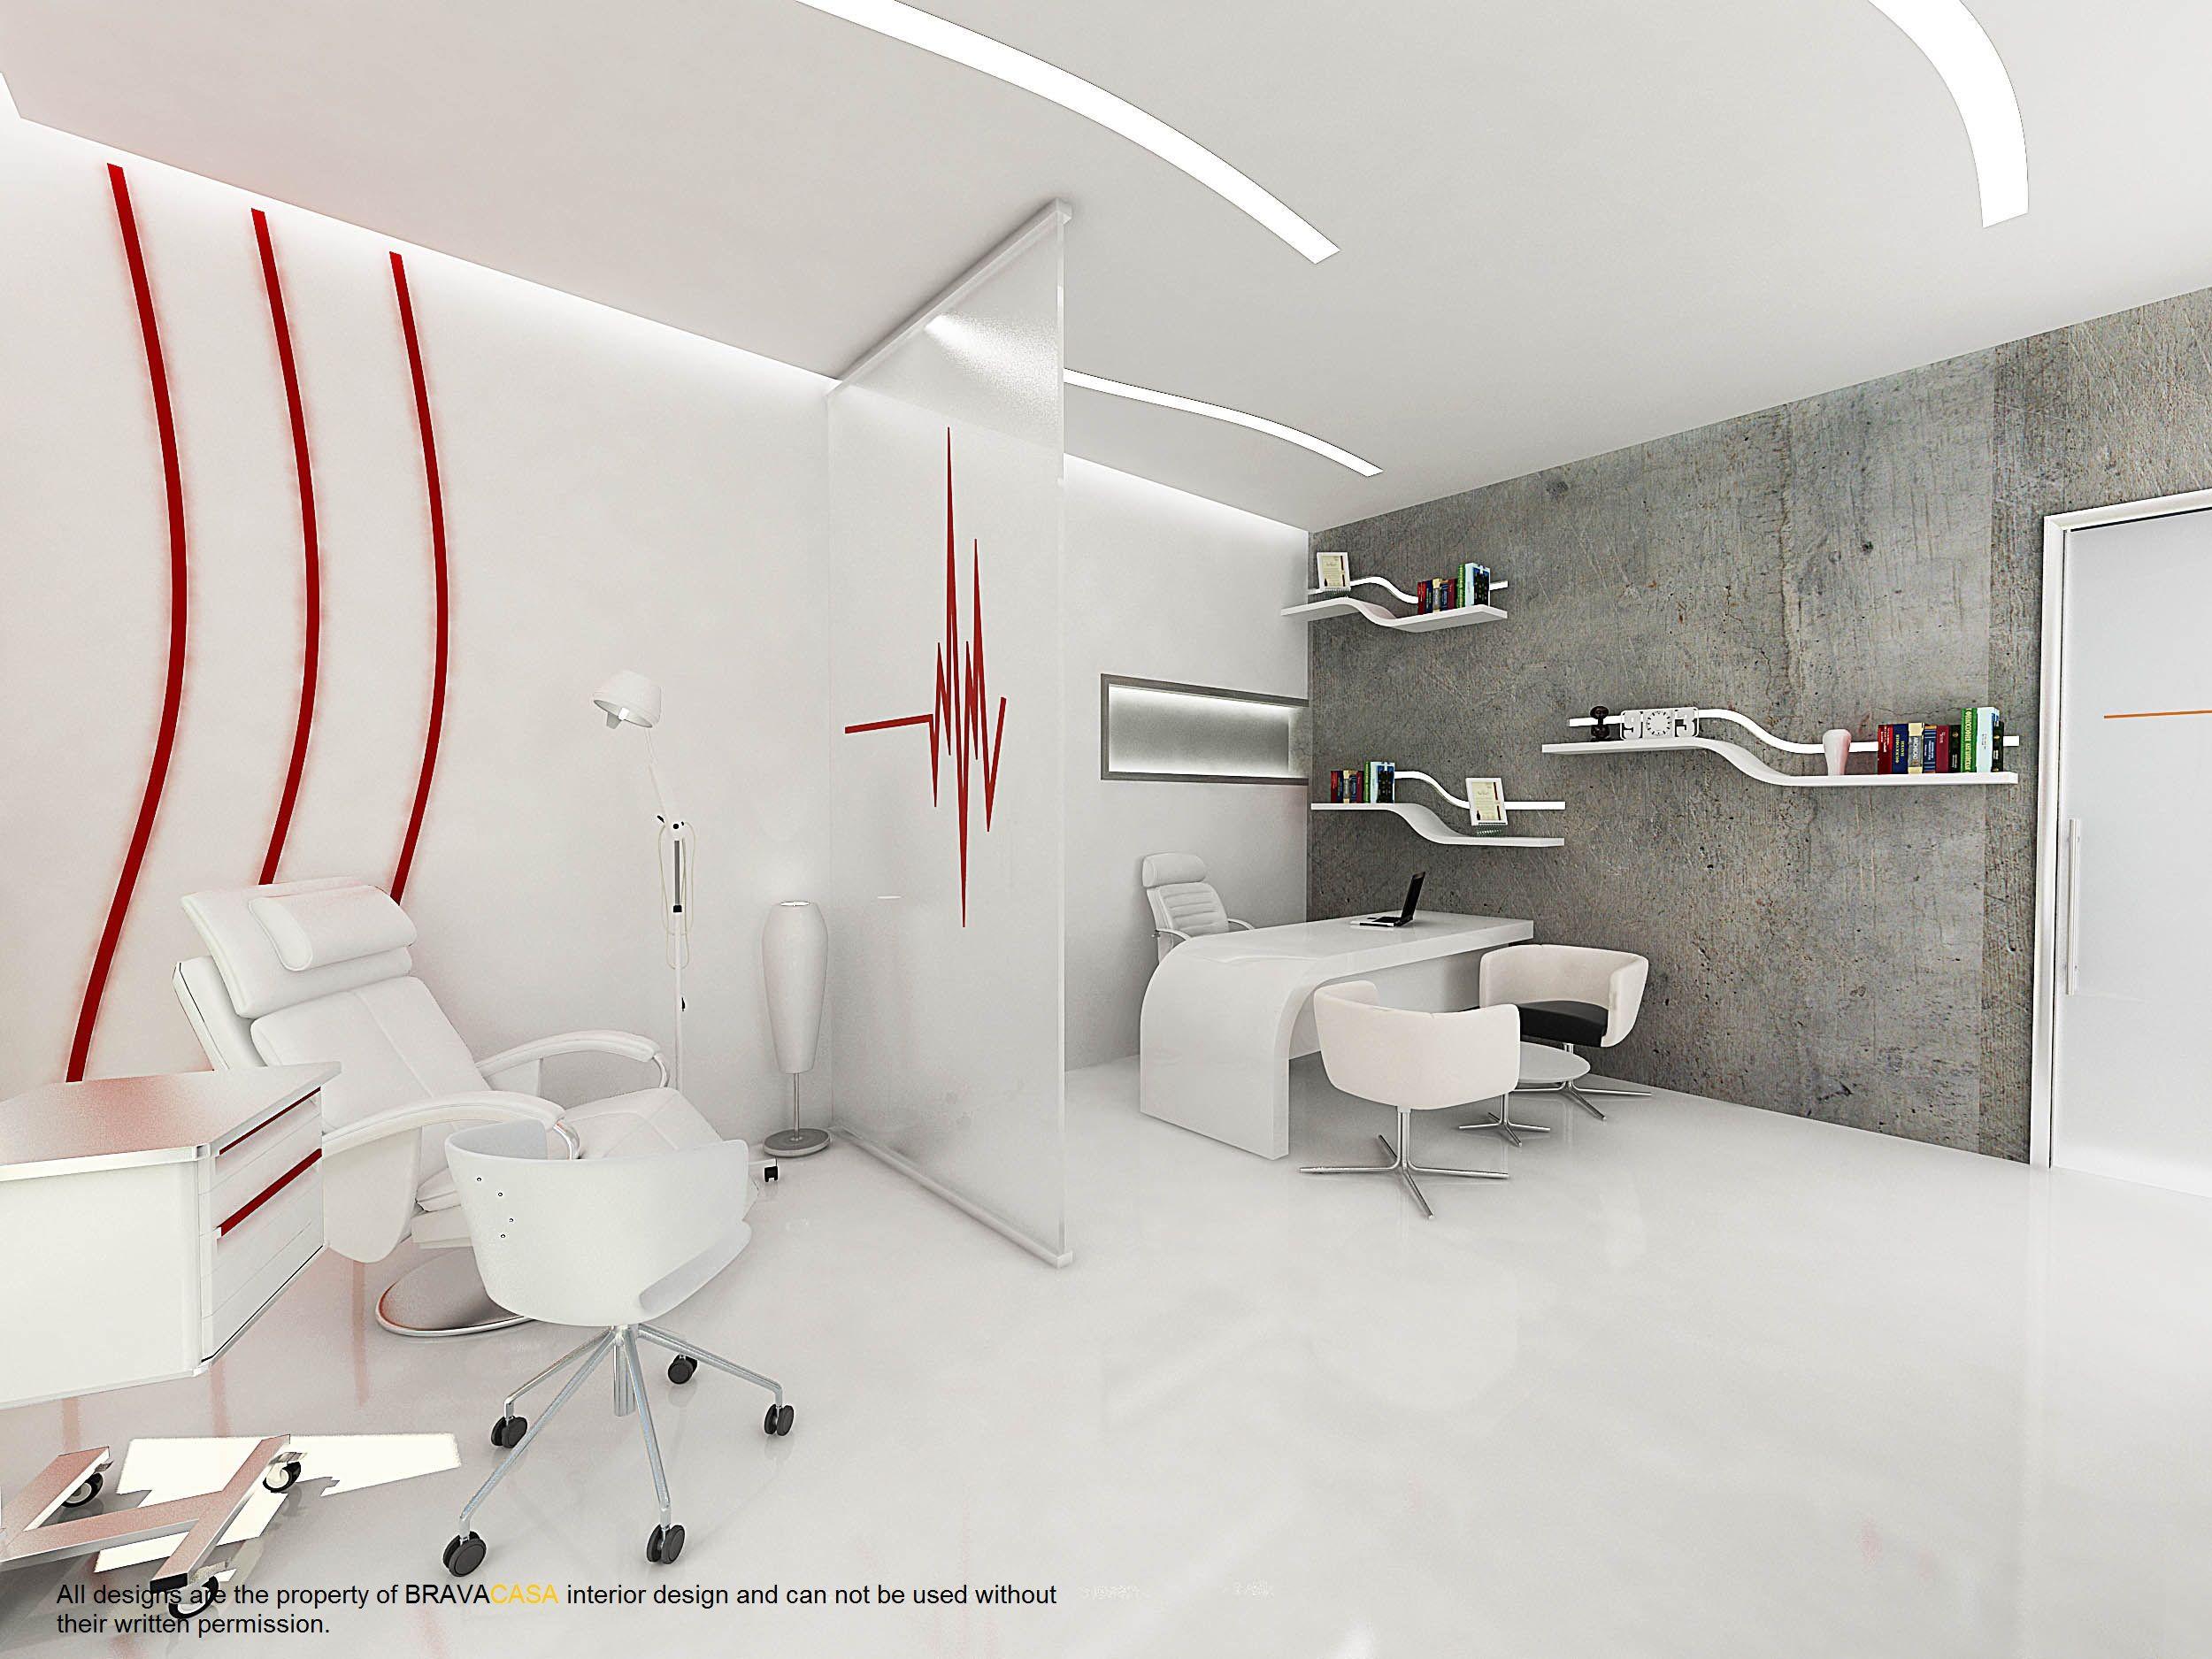 Aesthetic medical center bravacasa interior design pinterest medical center treatment for Dermatology clinic interior design